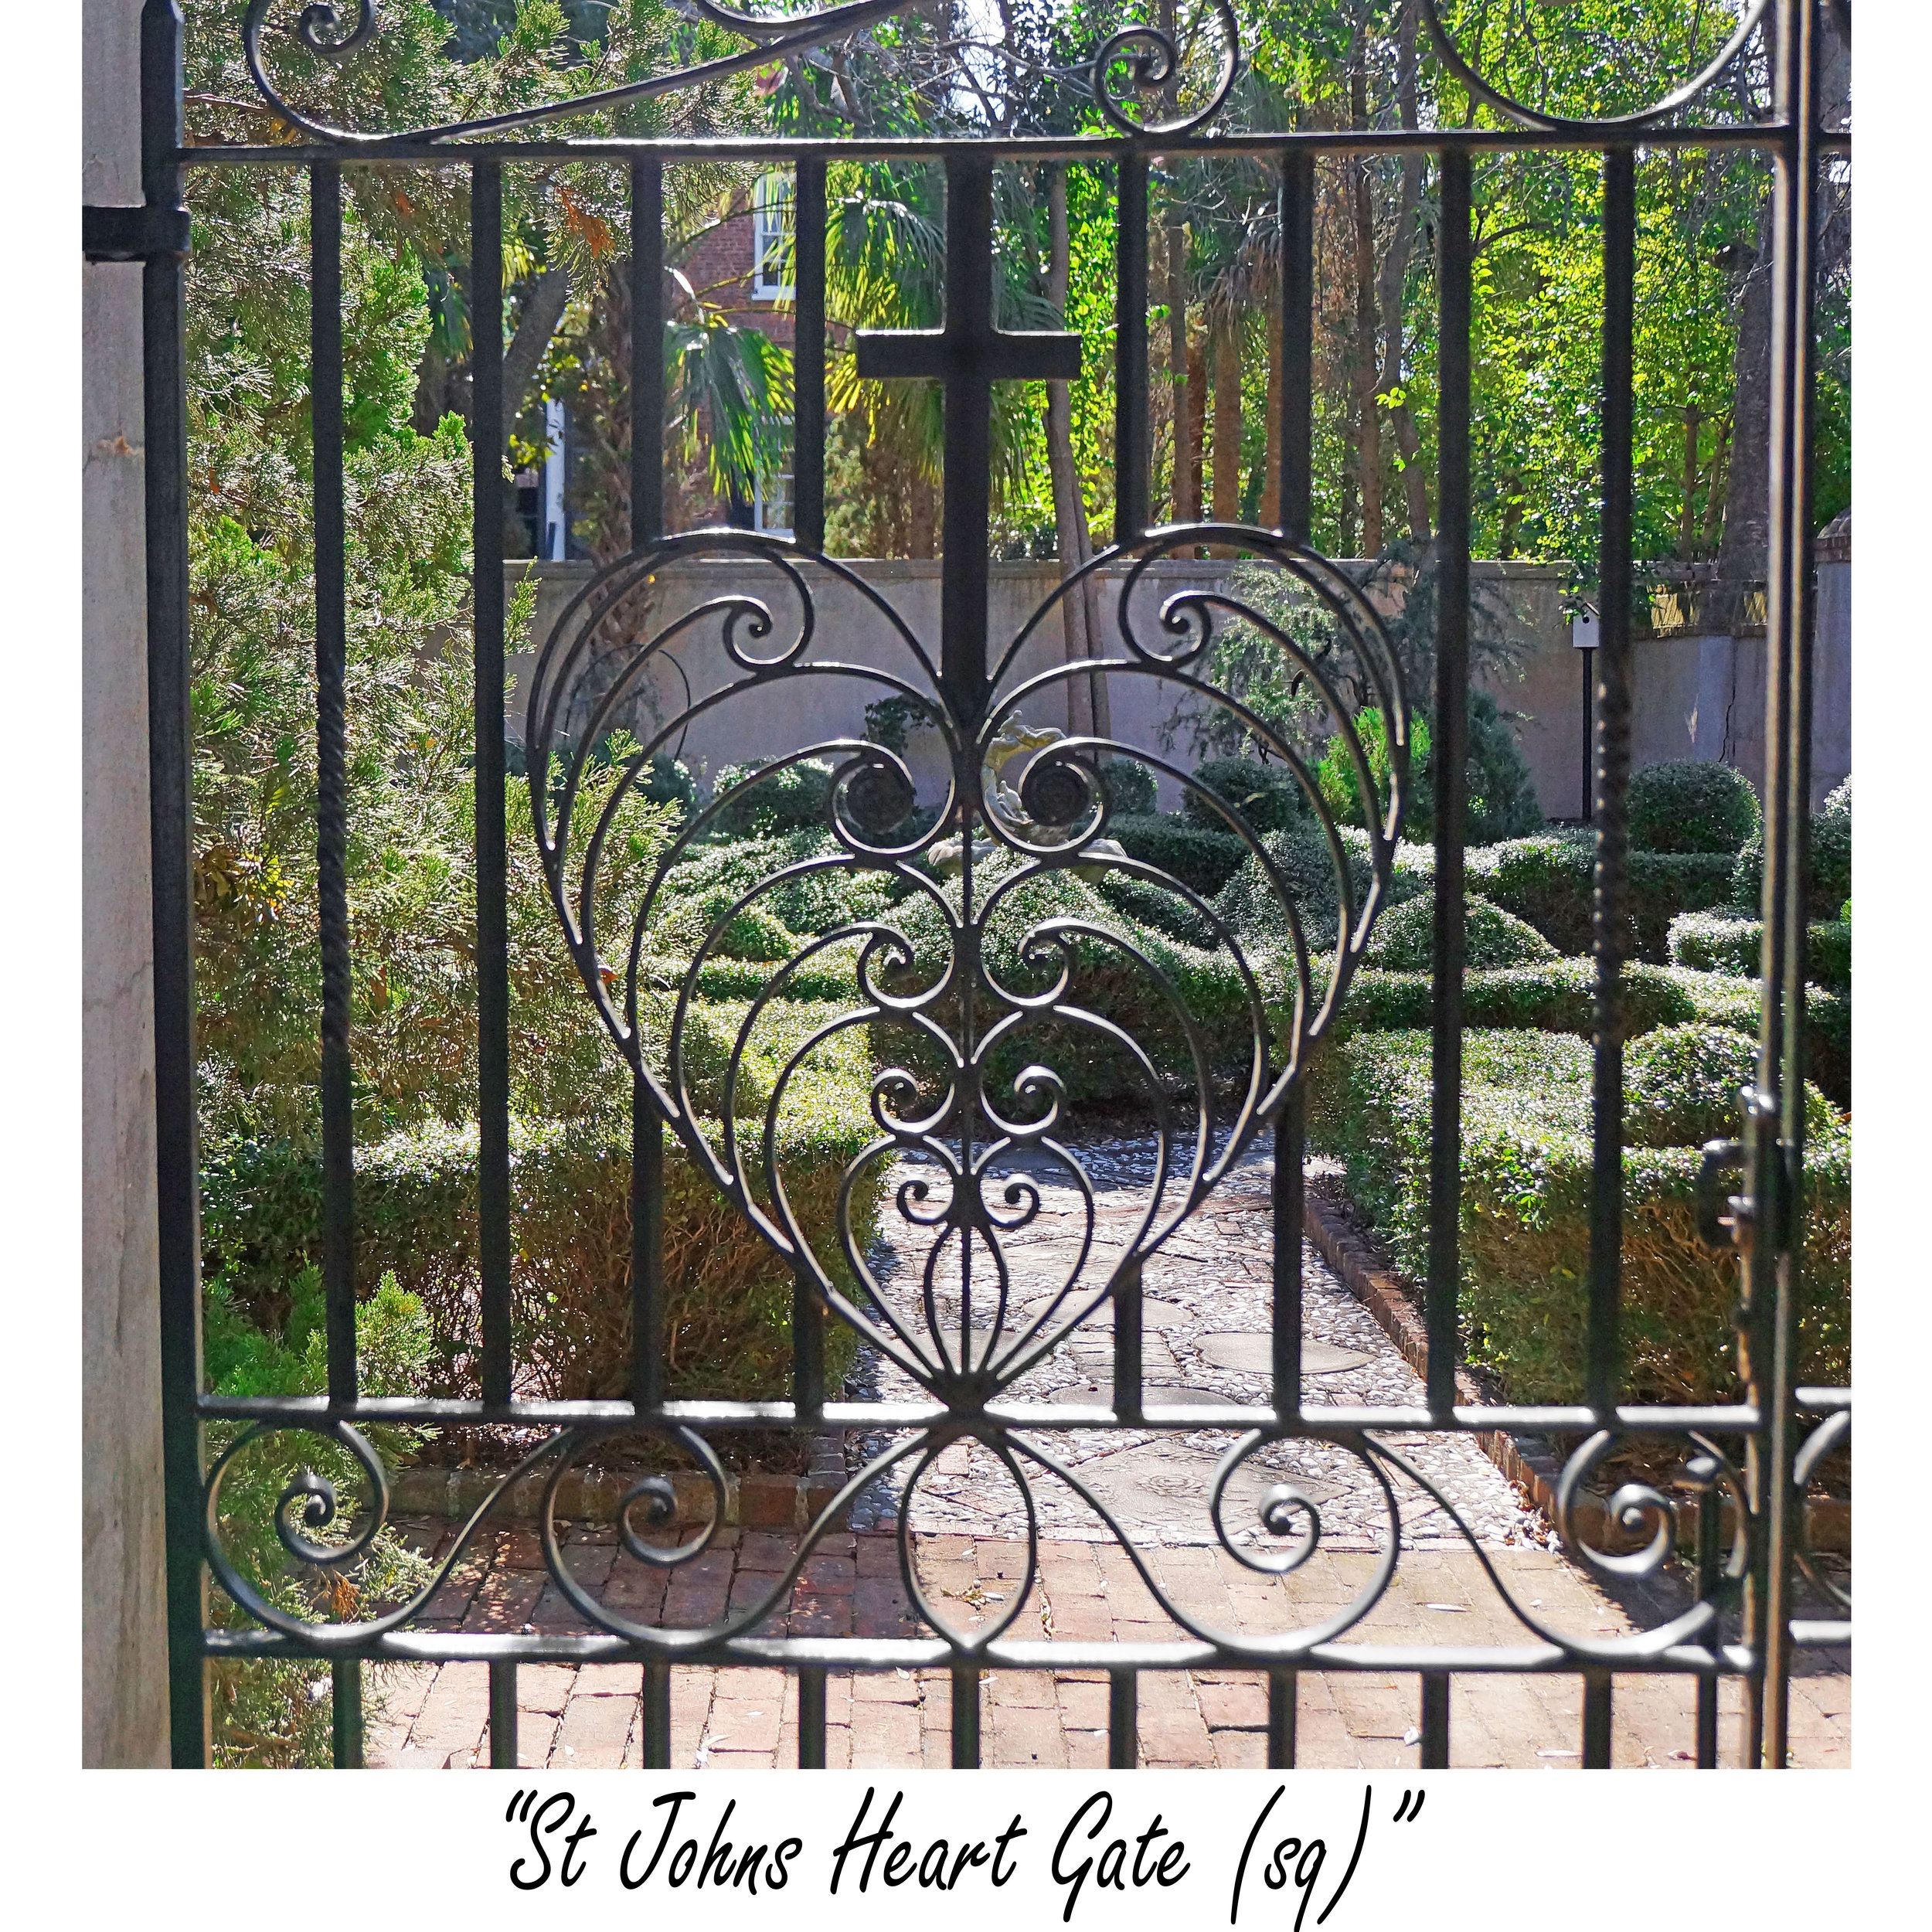 St johns Heart gate (sq).jpg